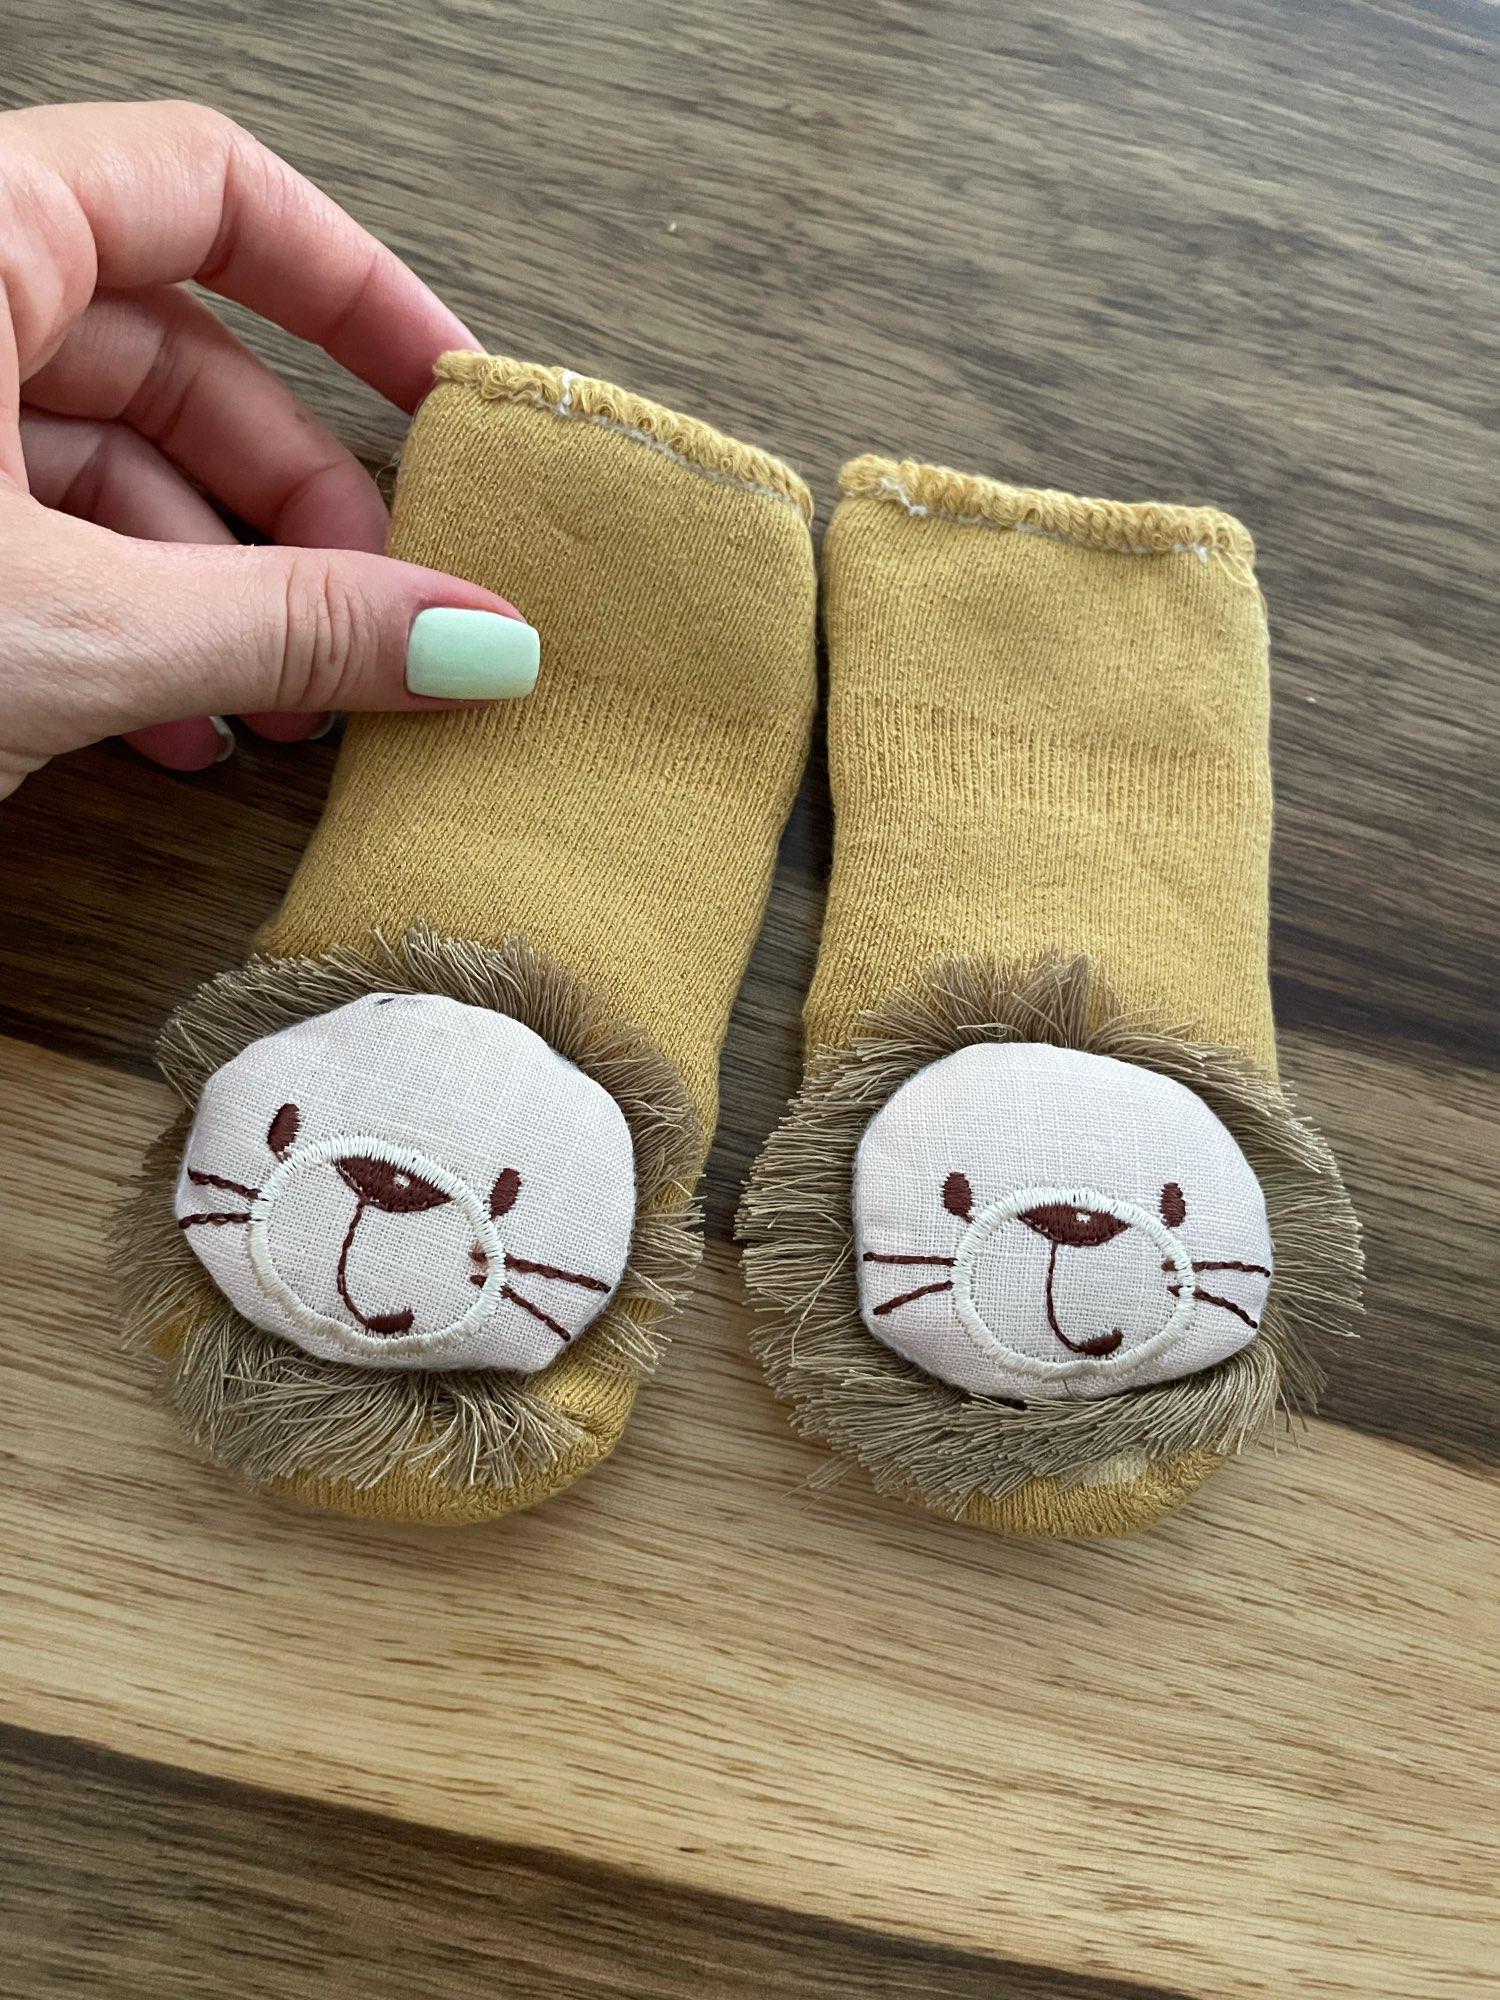 Autumn Winter Baby Girls Socks Newborn Cartoon Animal Baby Socks Infant Baby Boy Socks Anti Slip Soft Cotton Floor Sock Shoes photo review